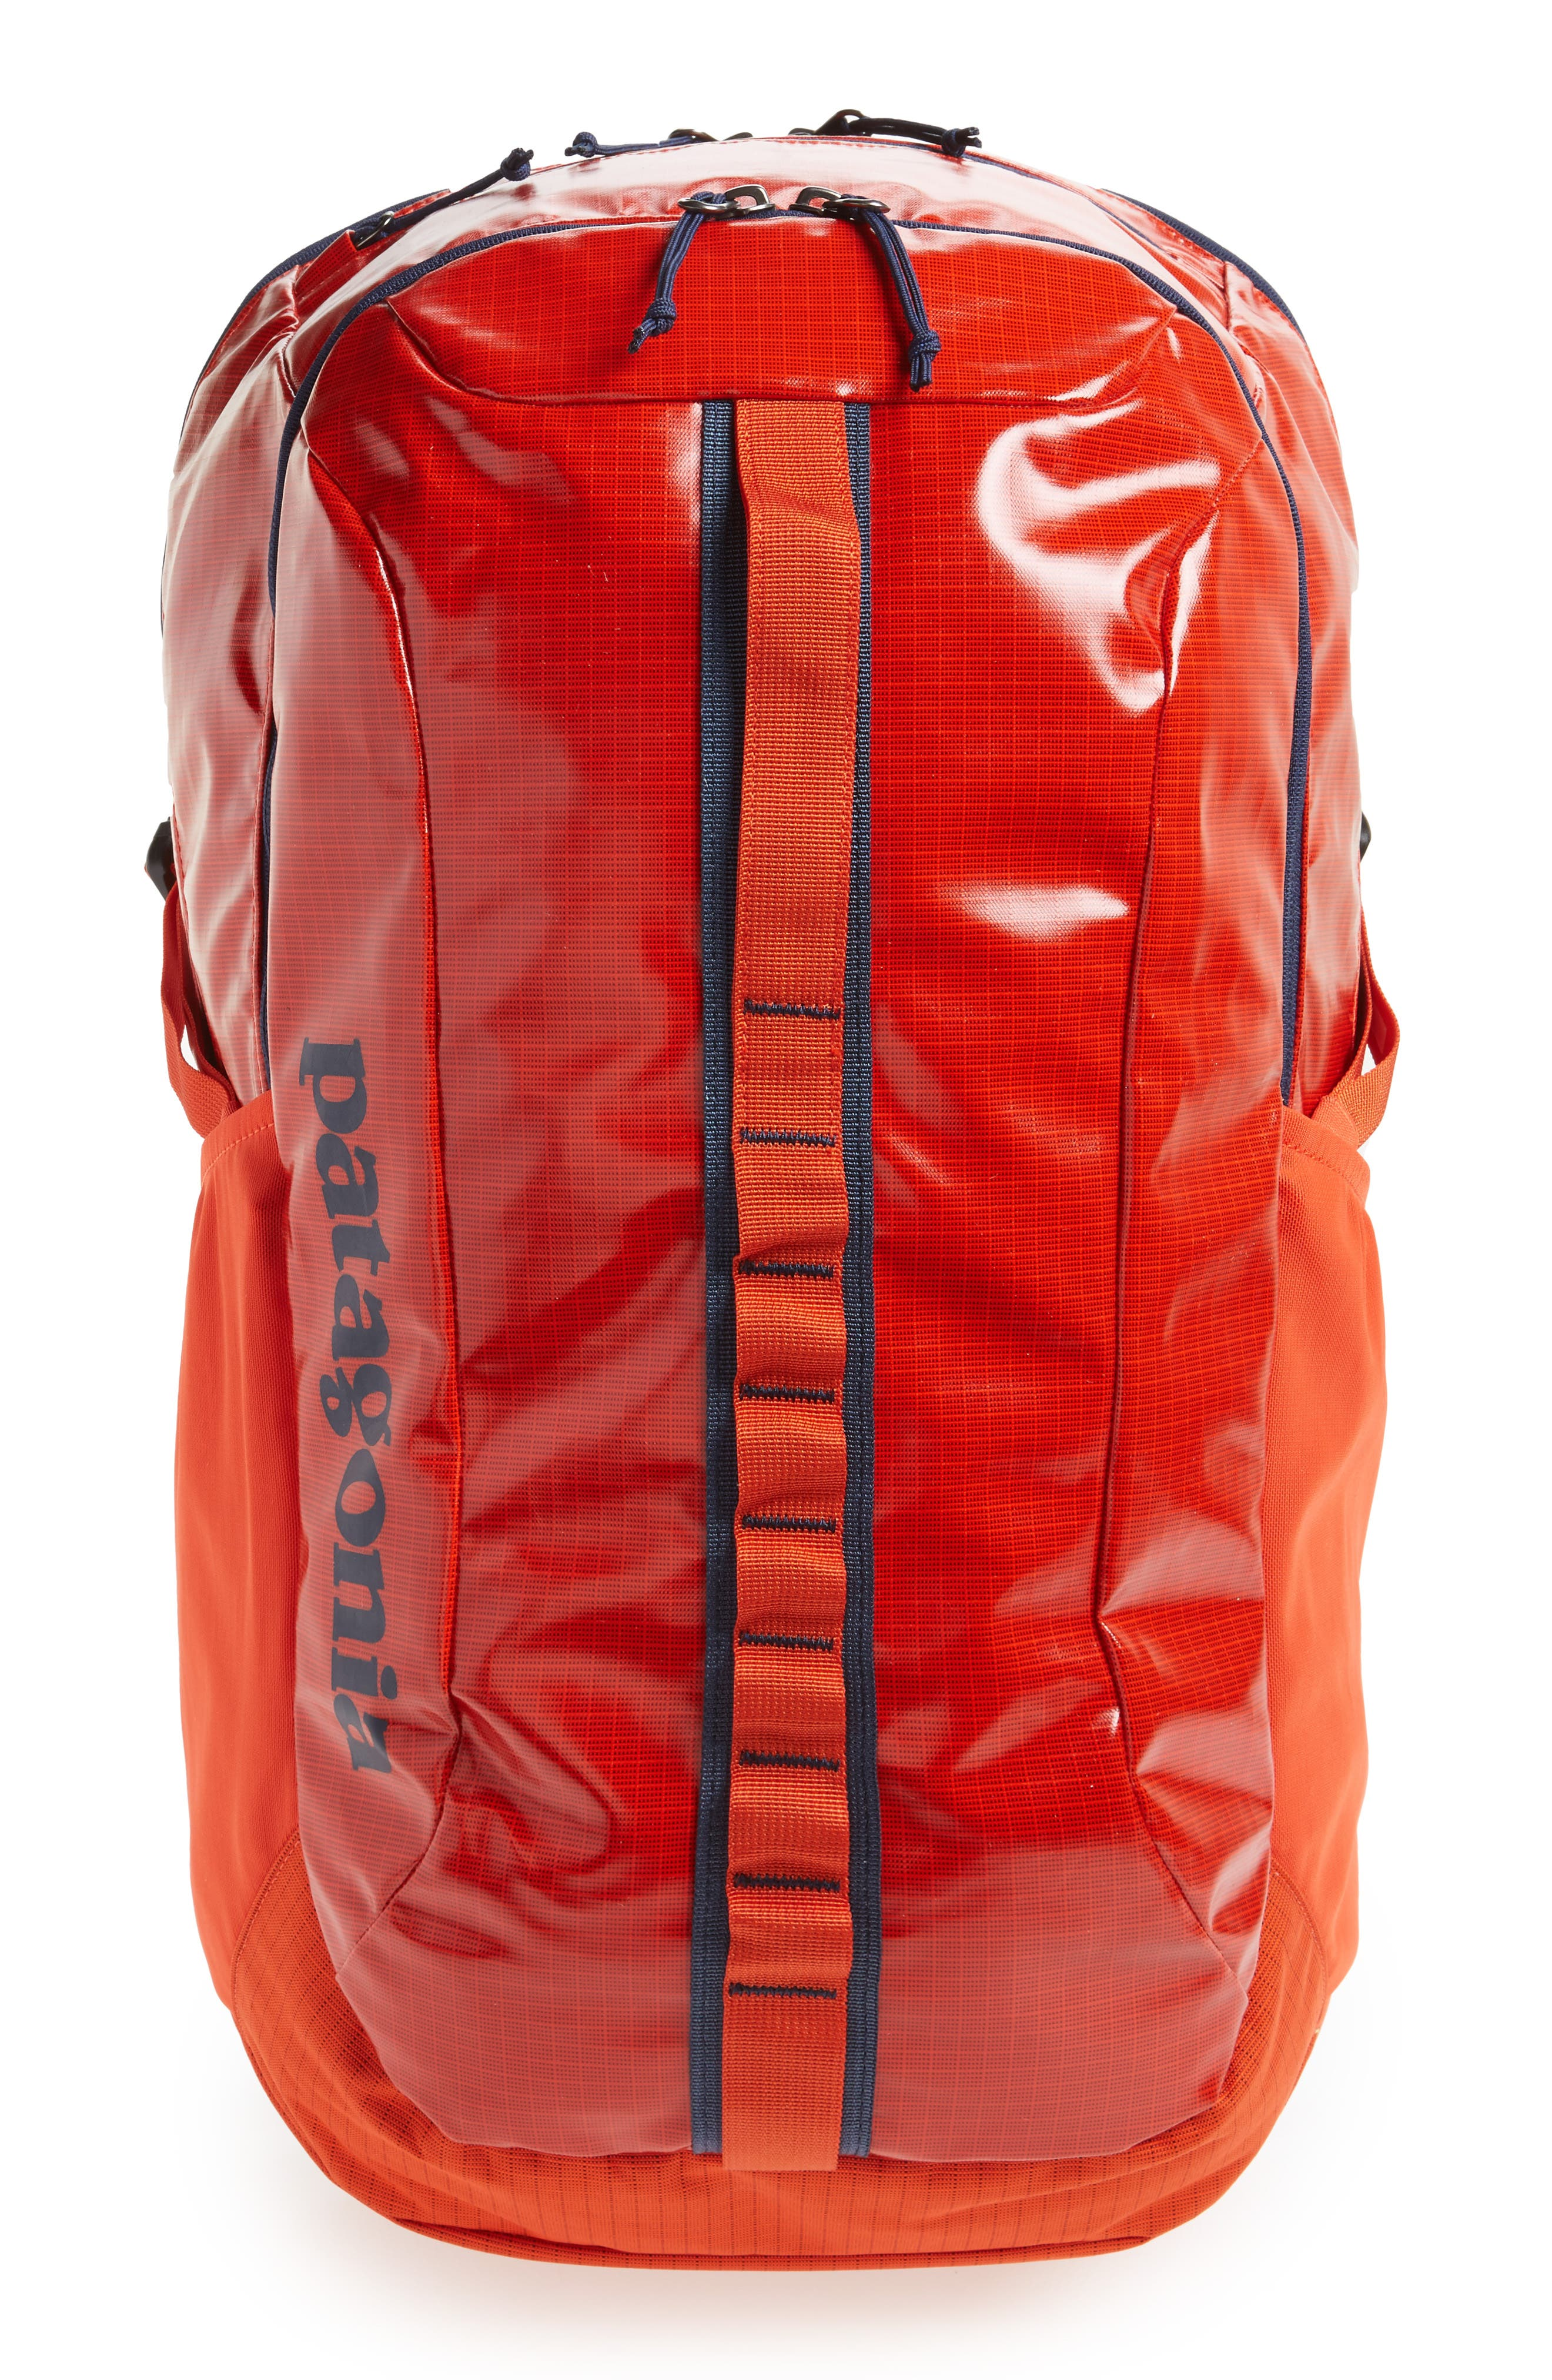 Black Hole 30-Liter Backpack,                         Main,                         color, Paintbrush Red